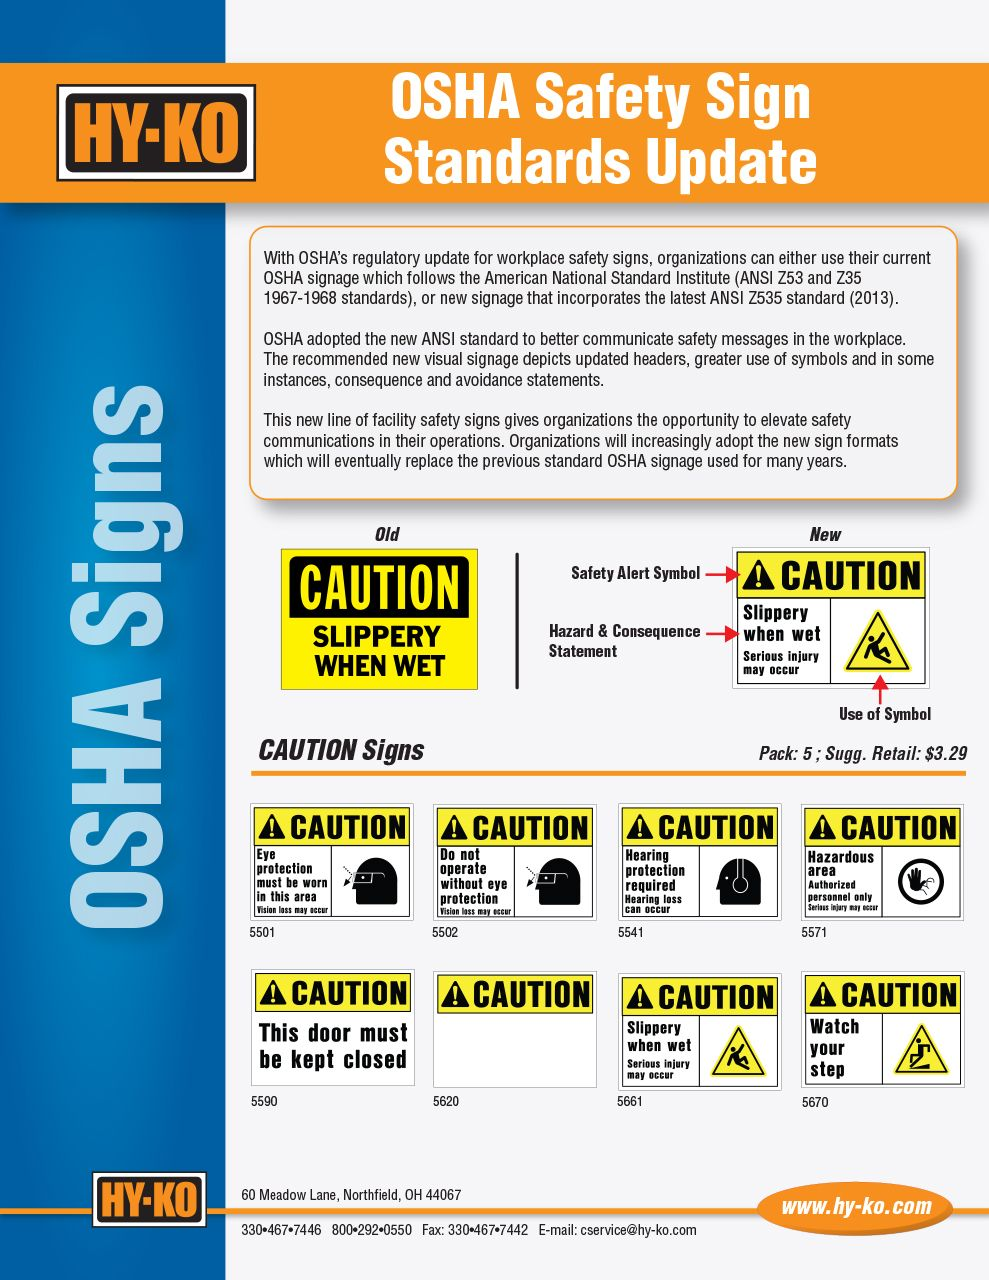 OSHA Safety Sign Standards Update